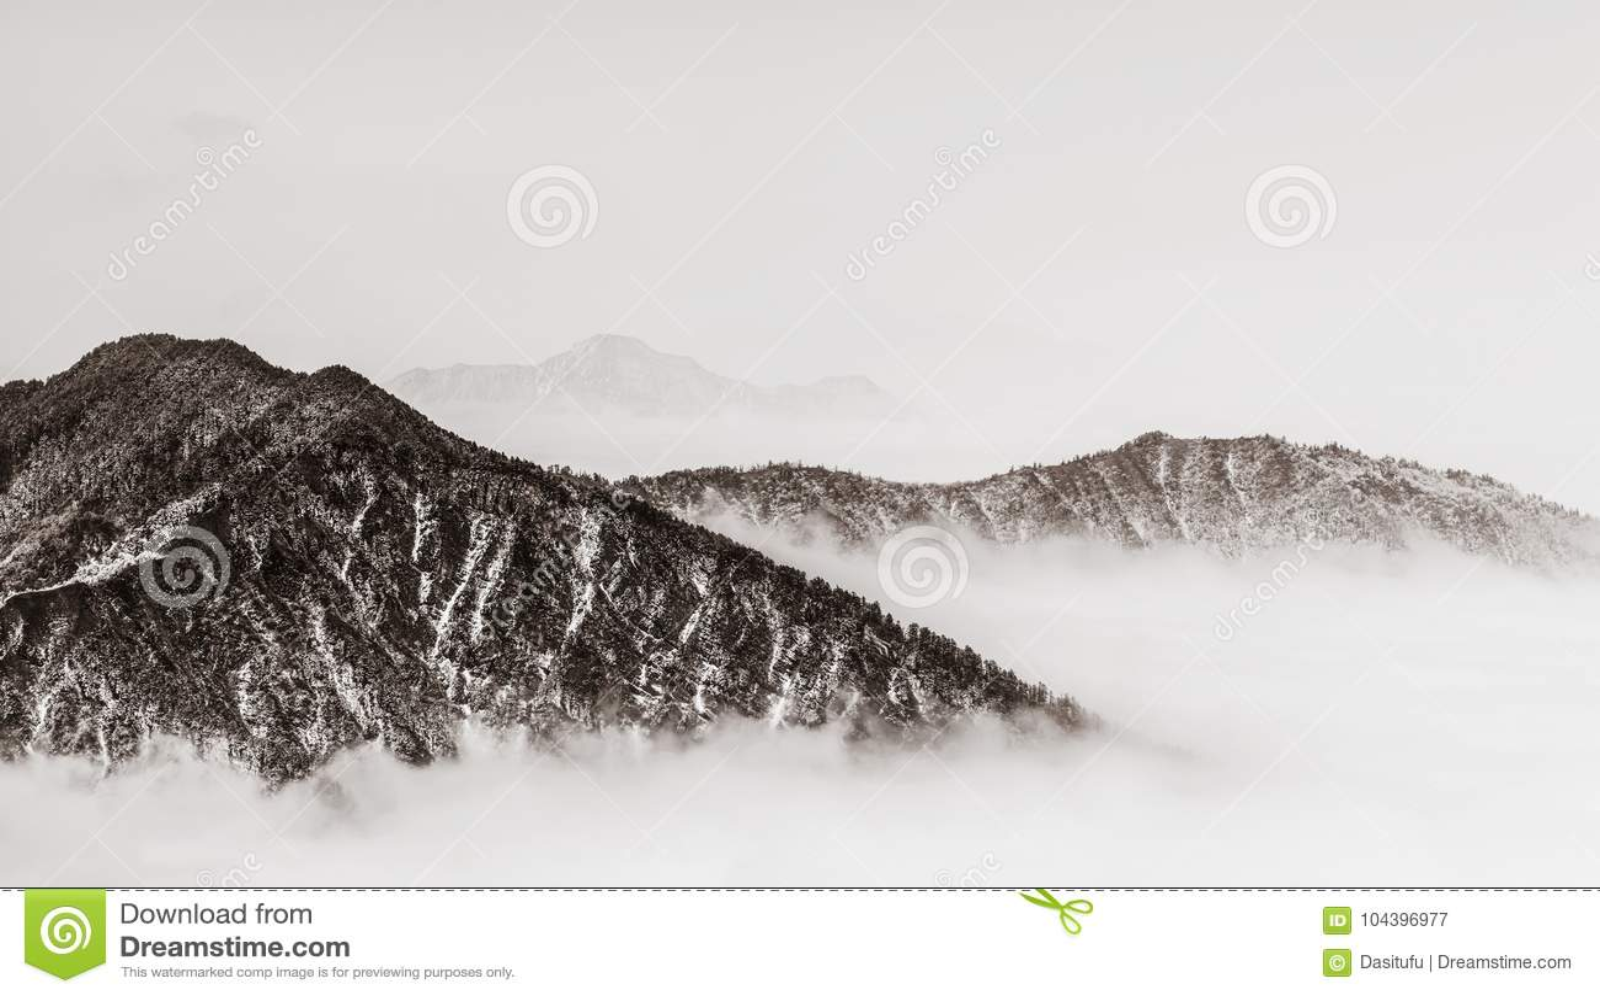 Montañas con estilo retro